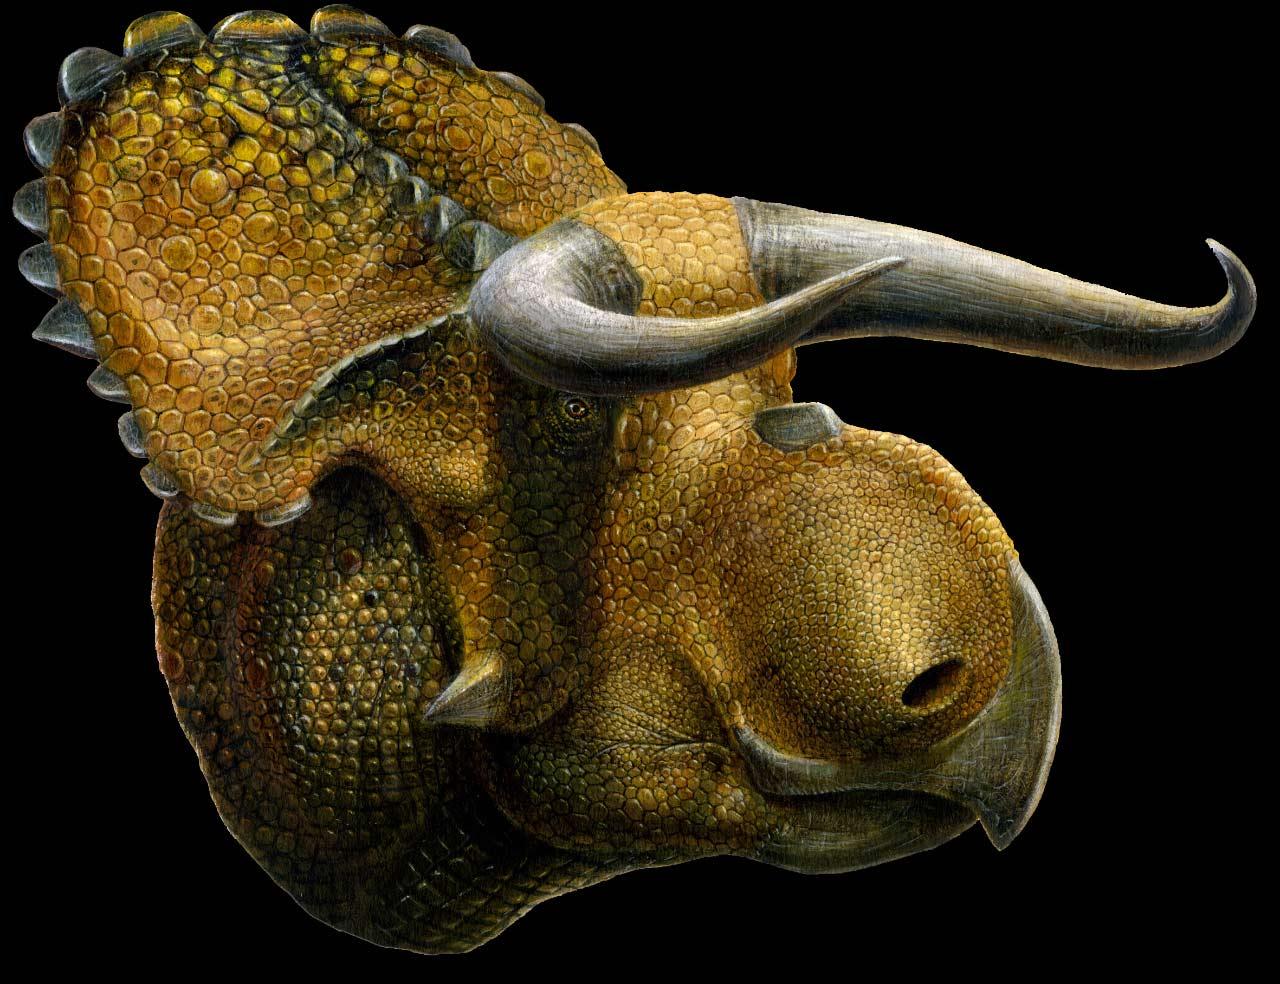 image_1237_1e-Nasutoceratops.jpg